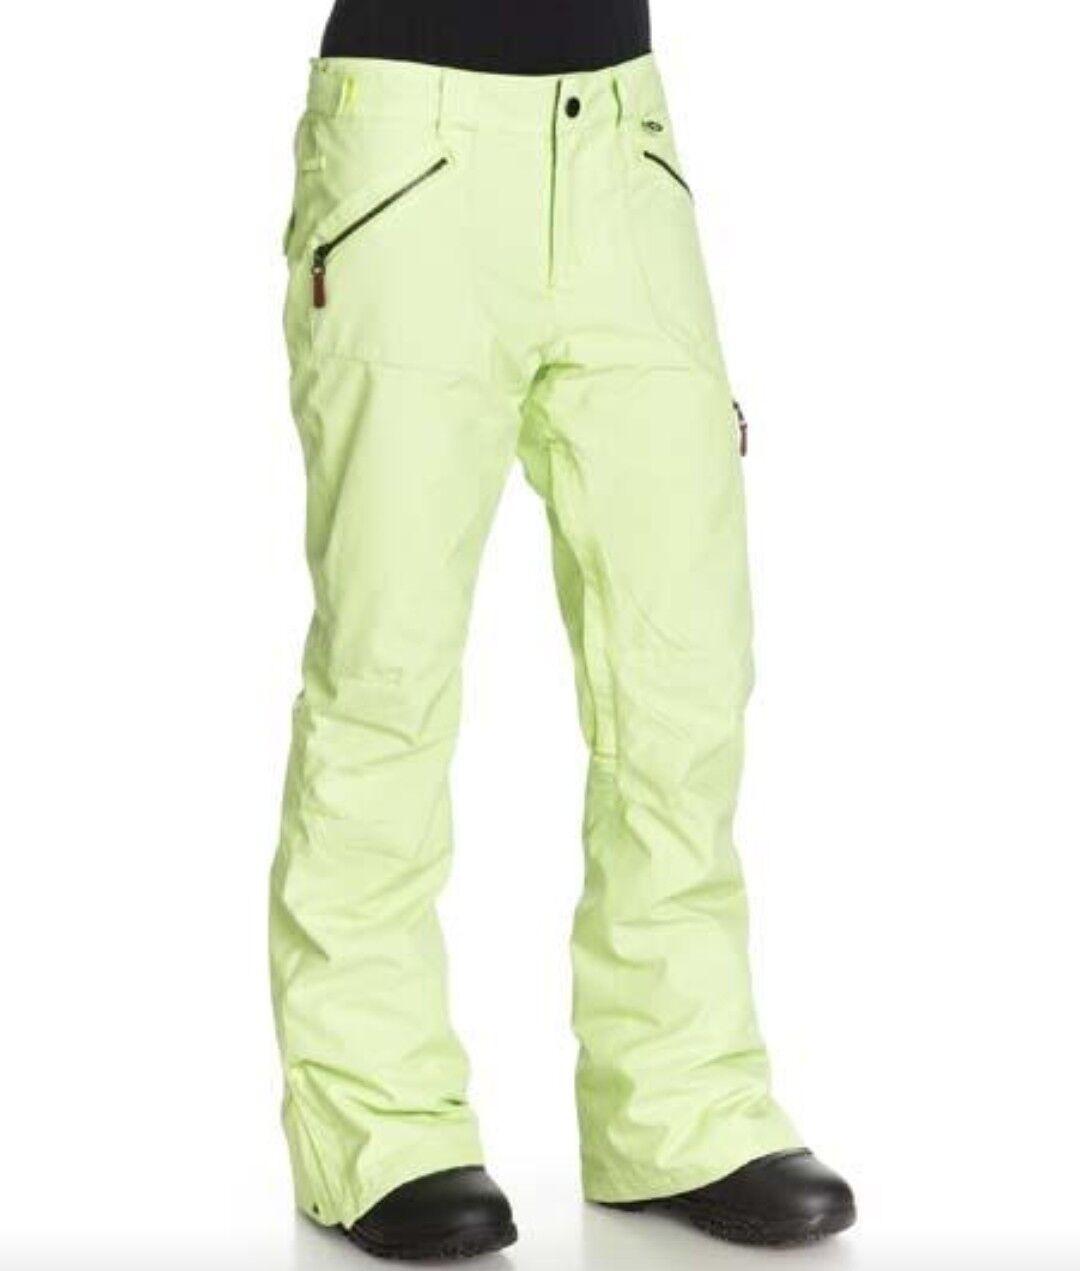 ROXY  Nadia pants  Dammen  Winterhose Skihose Snowboardhose Schneehose